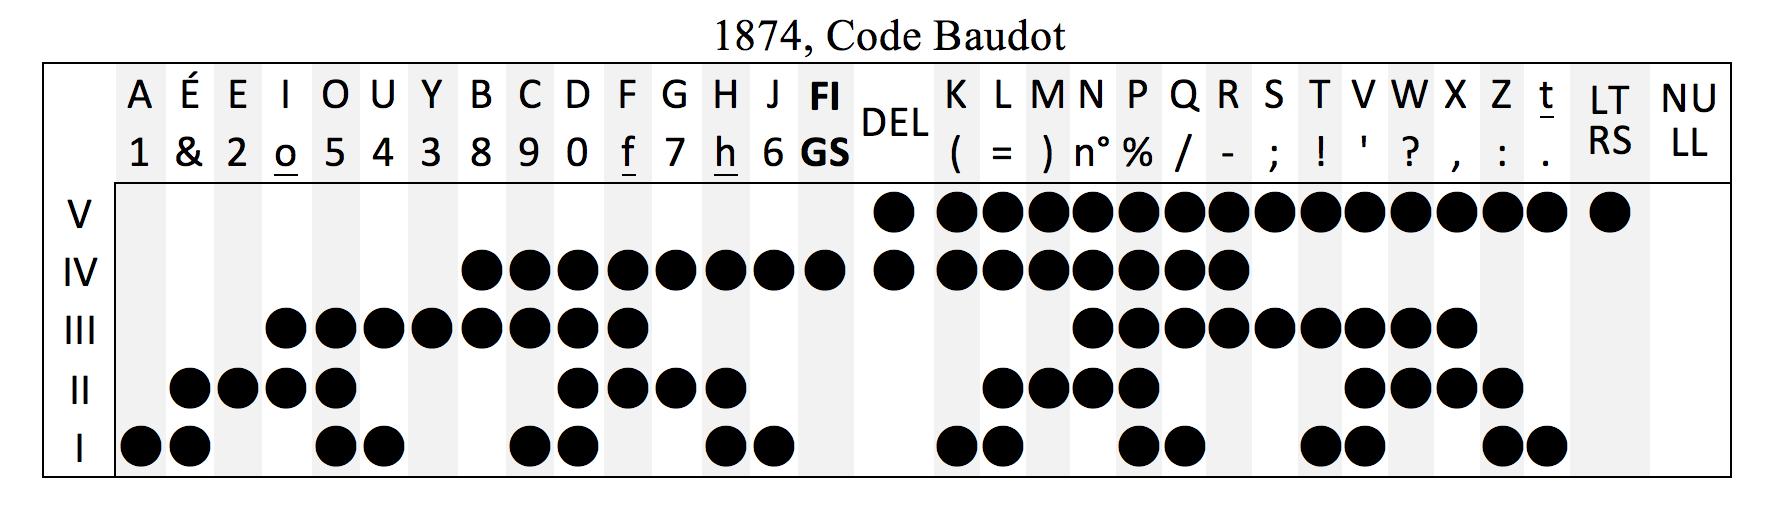 Code Baudot